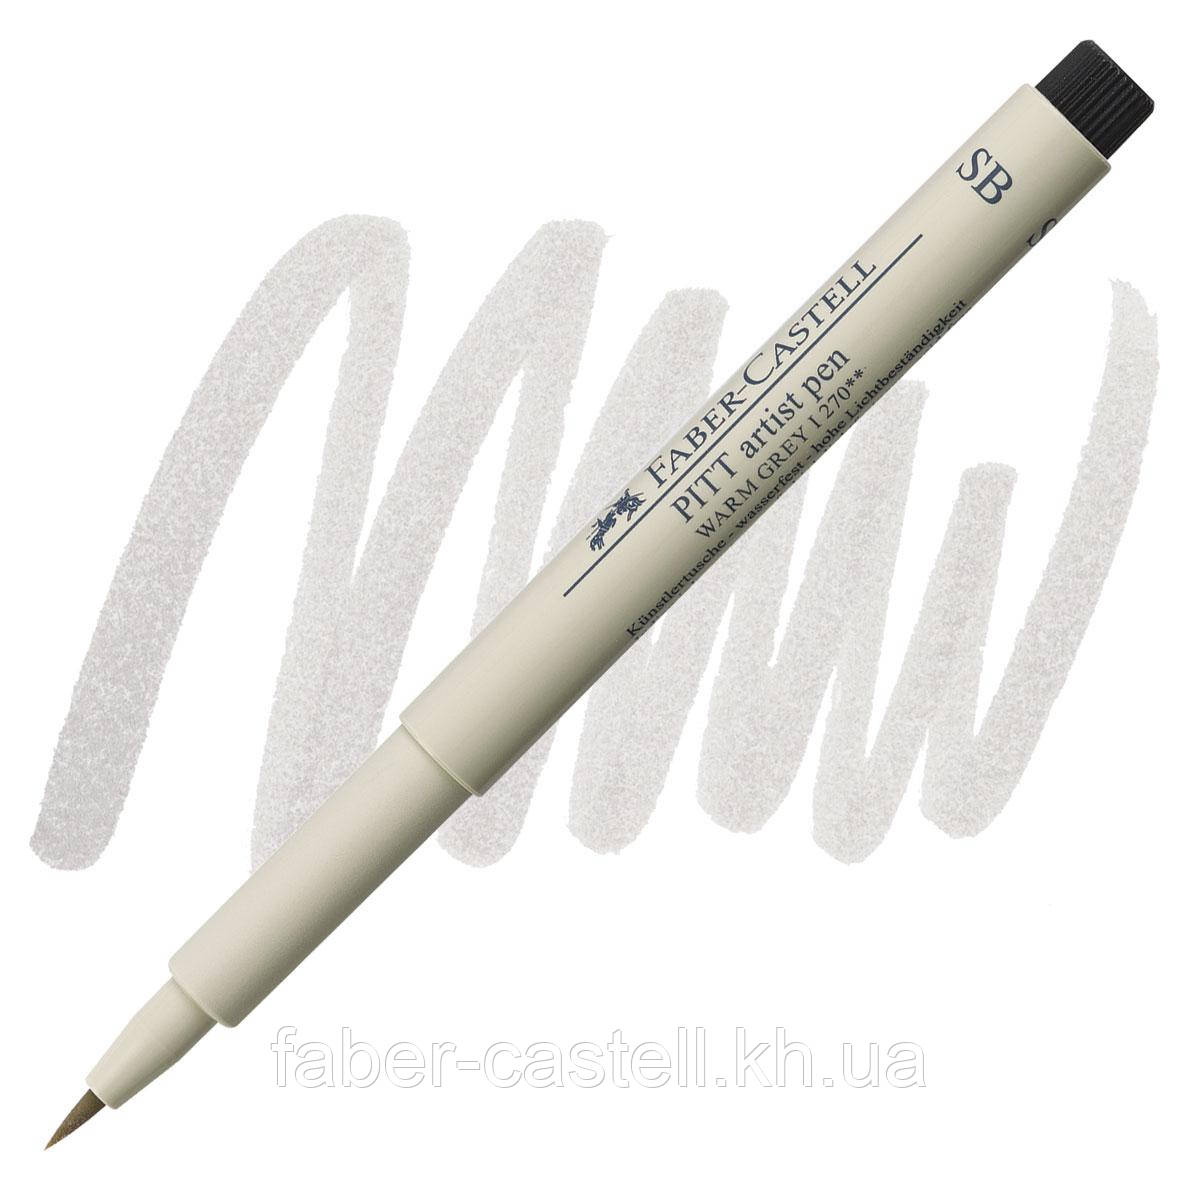 "Ручка-кисточка капиллярная Faber - Castell PITT® ARTIST PEN ""SOFT BRUSH"" № 270 теплый серый I, 167870"